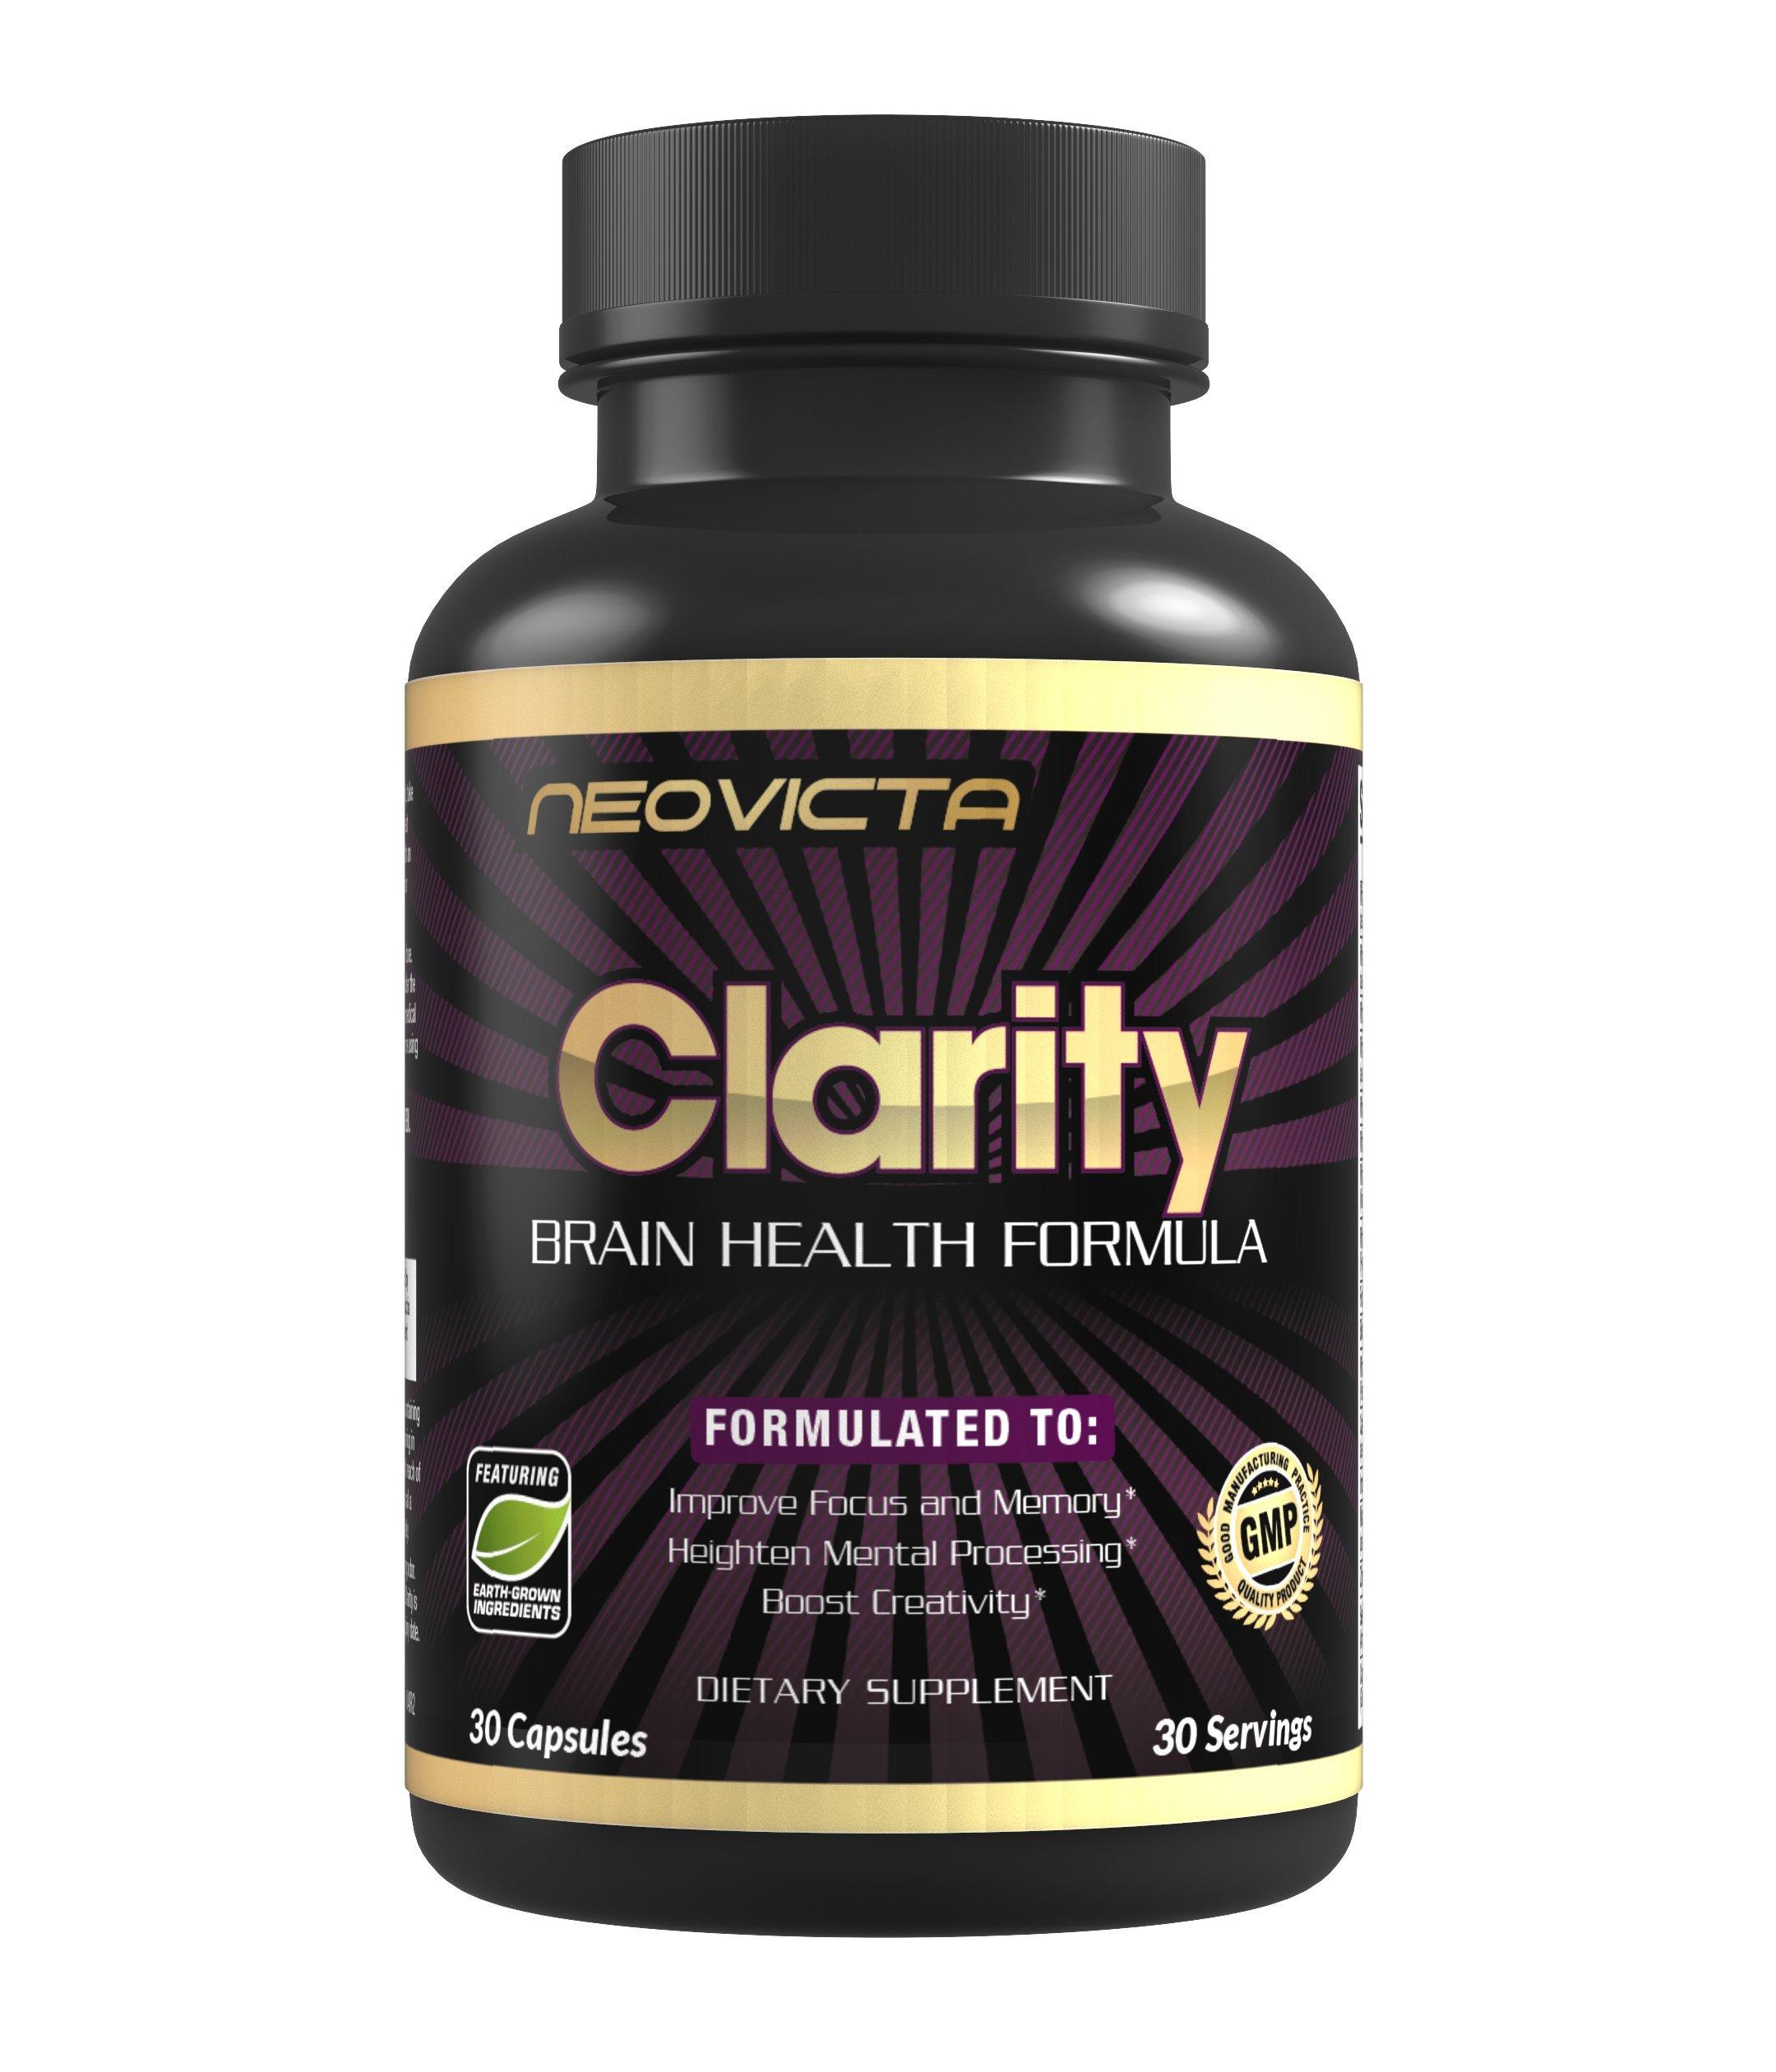 #1 Brain Supplement Nootropic - Mind & Energy Booster - Improve Focus, Memory & Mood - CLARITY - Superior Brain Function for Men & Women - 40+ Ingredients - 30 Servings - Money Back Guarantee